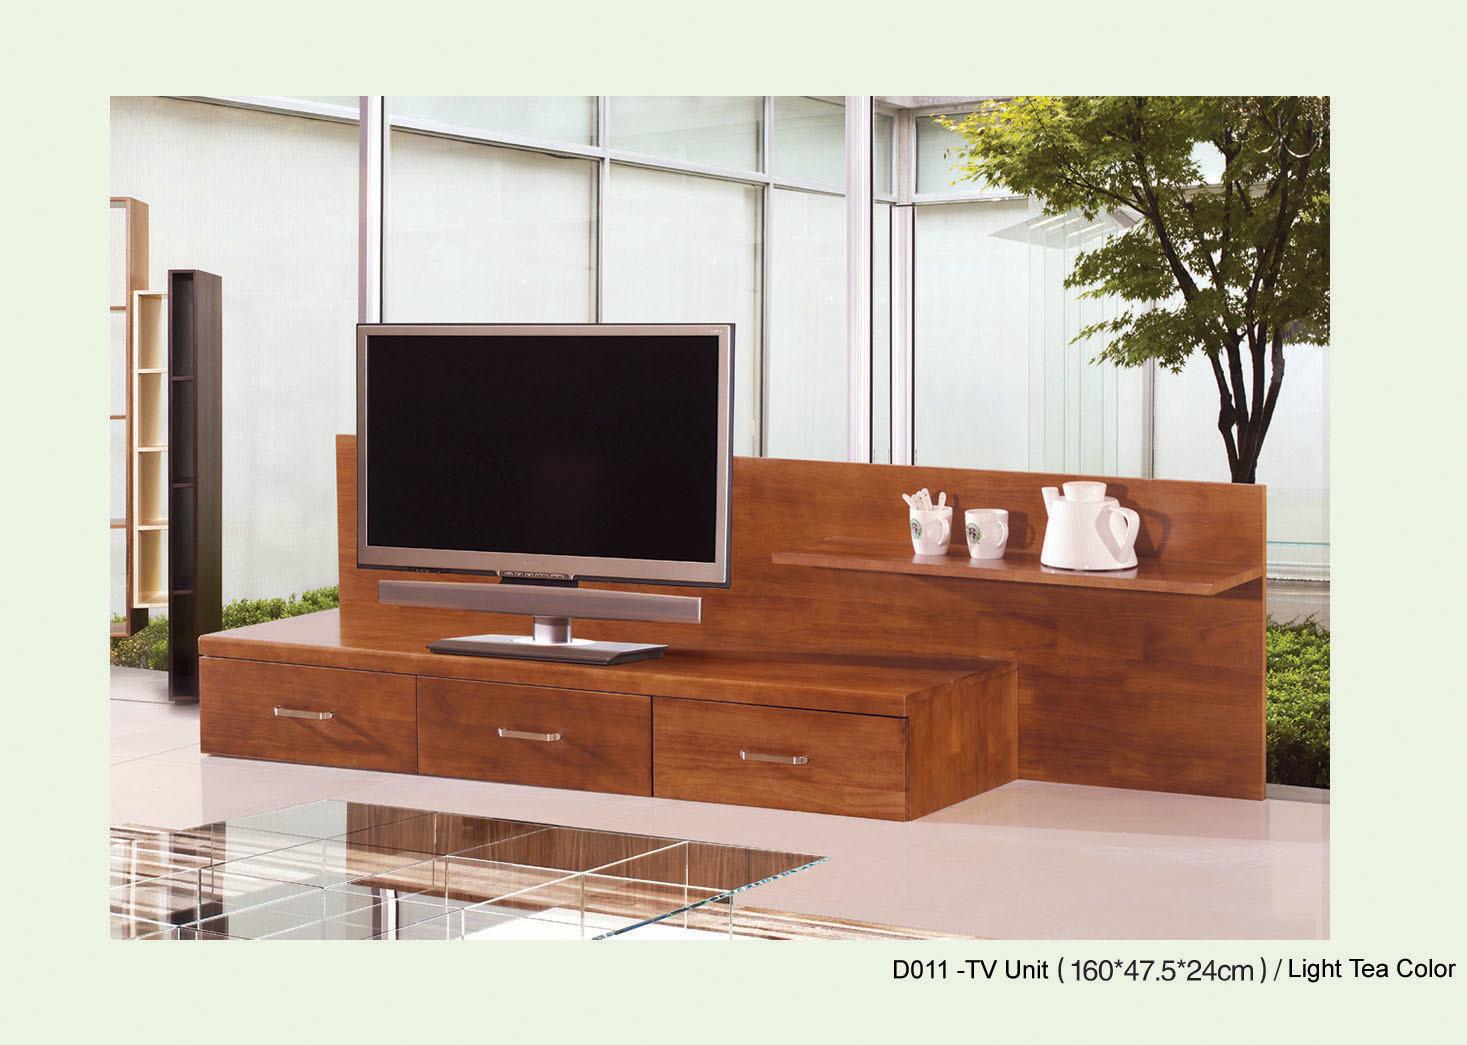 Muebles del soporte de la sala de estar tv d011 - Muebles sala de estar ...